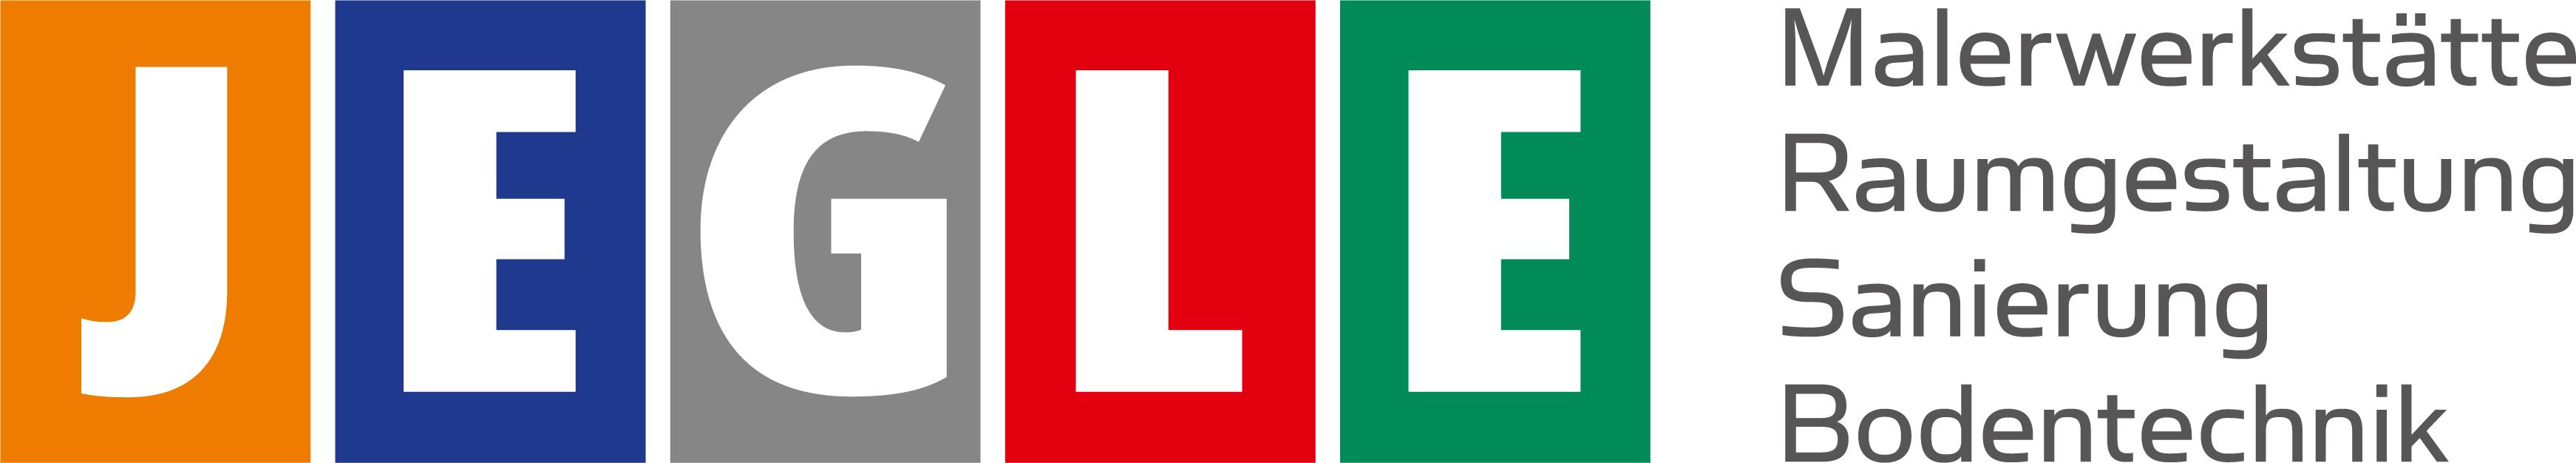 Jegle GmbH